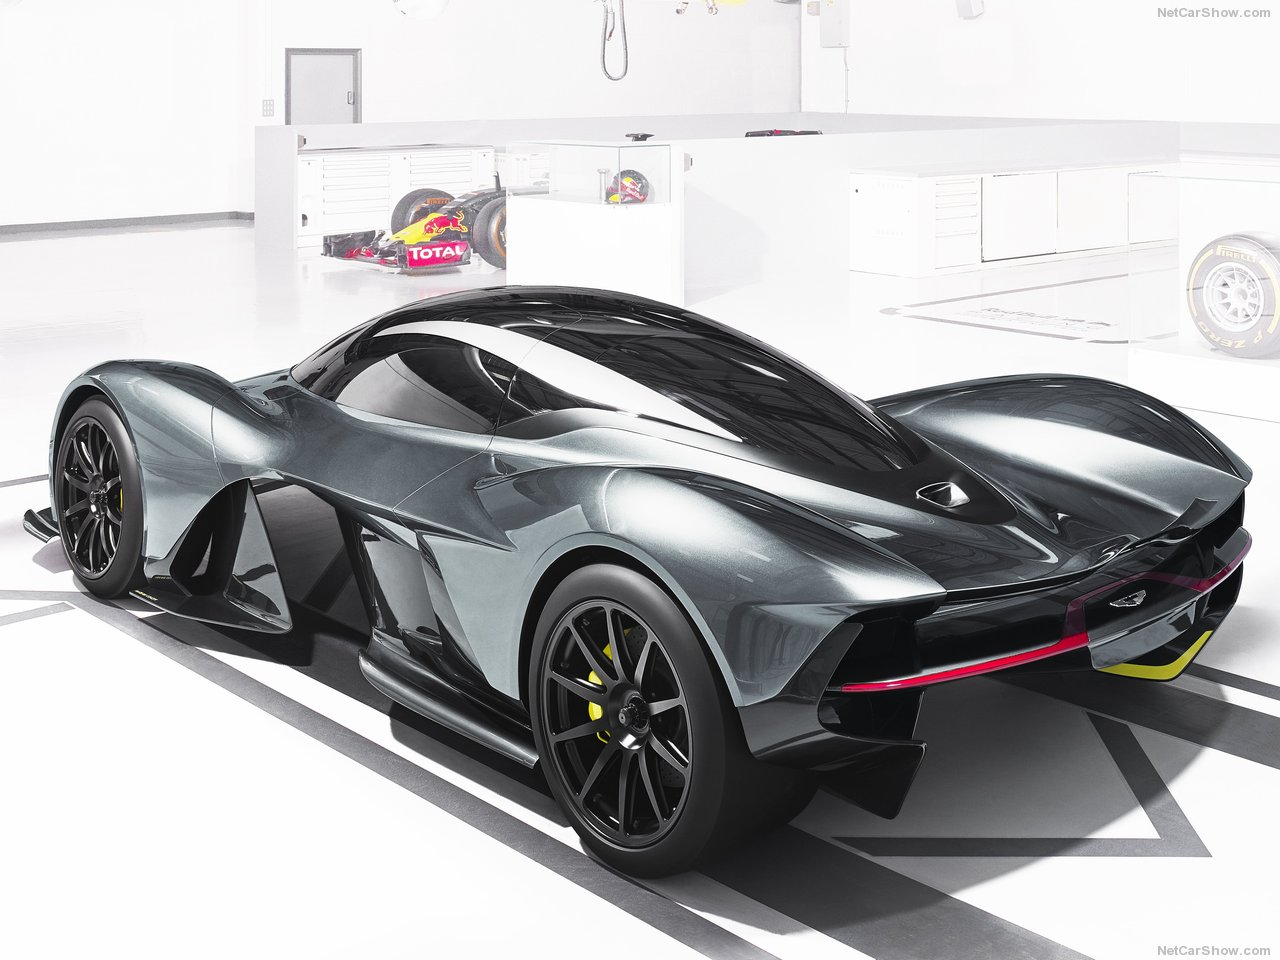 Aston Martin AM-RB